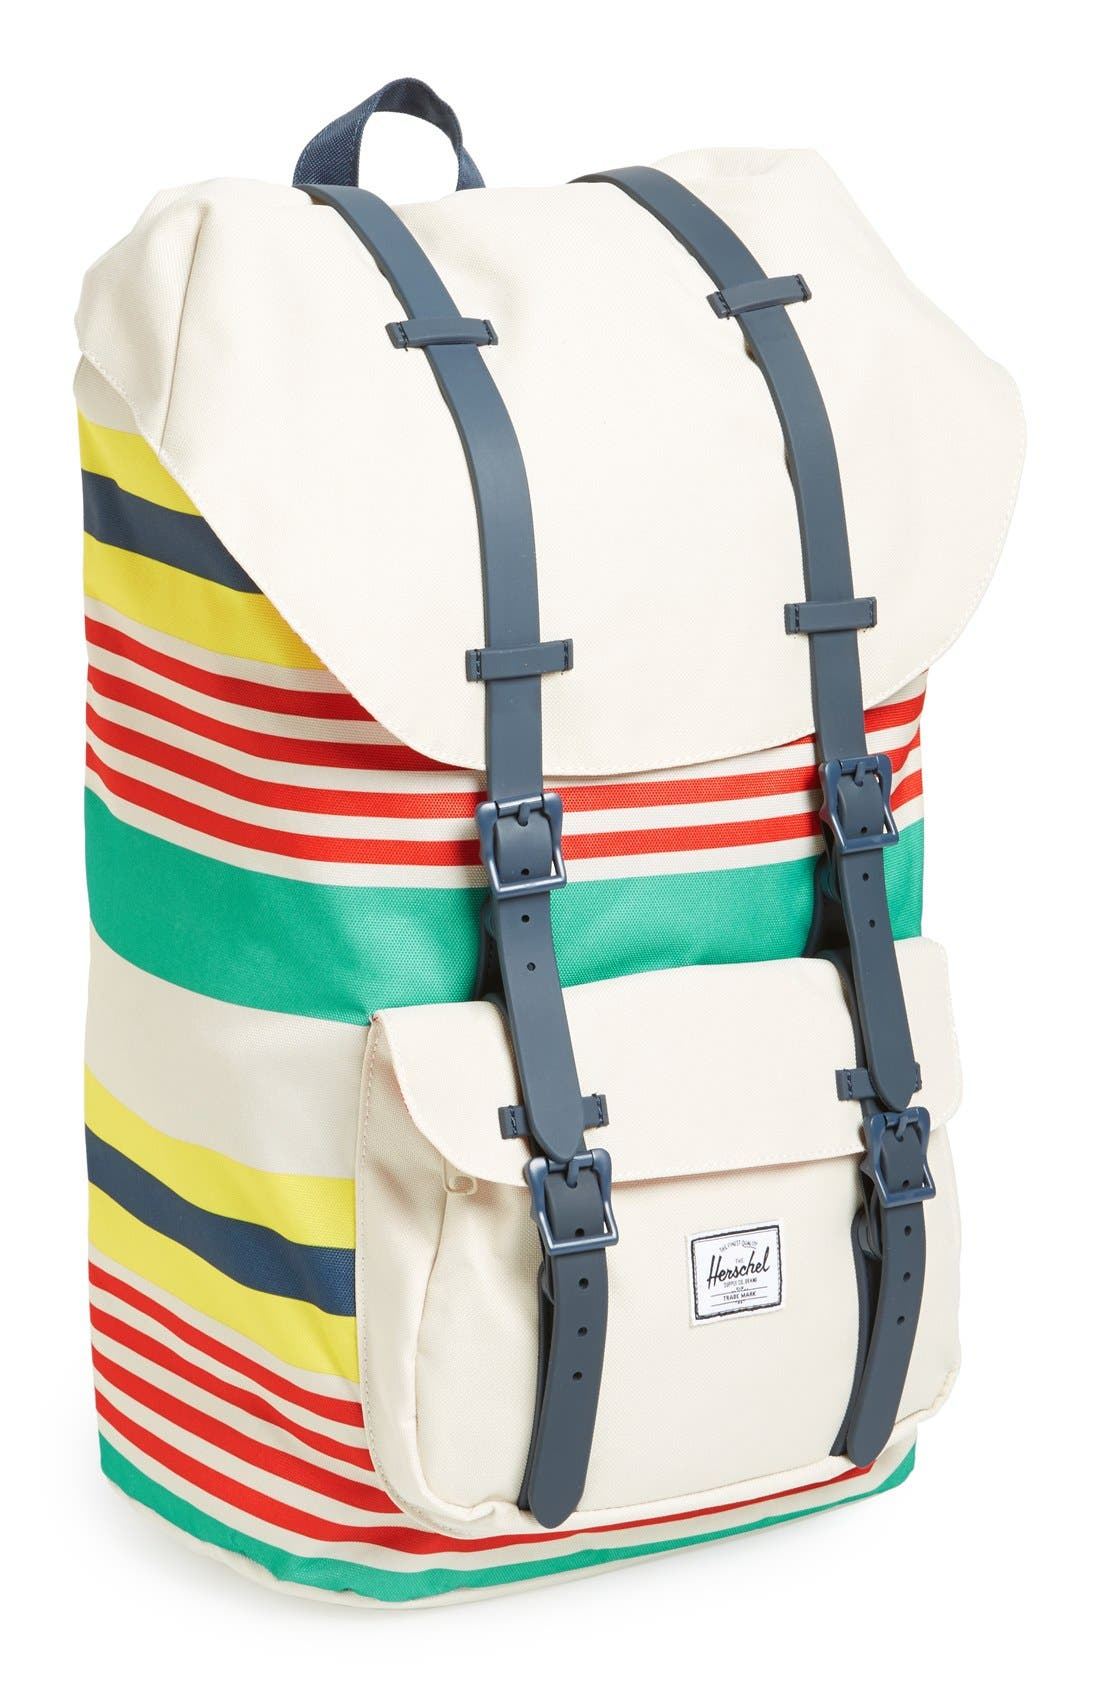 Alternate Image 1 Selected - Herschel Supply Co. 'Little America - Malibu' Backpack